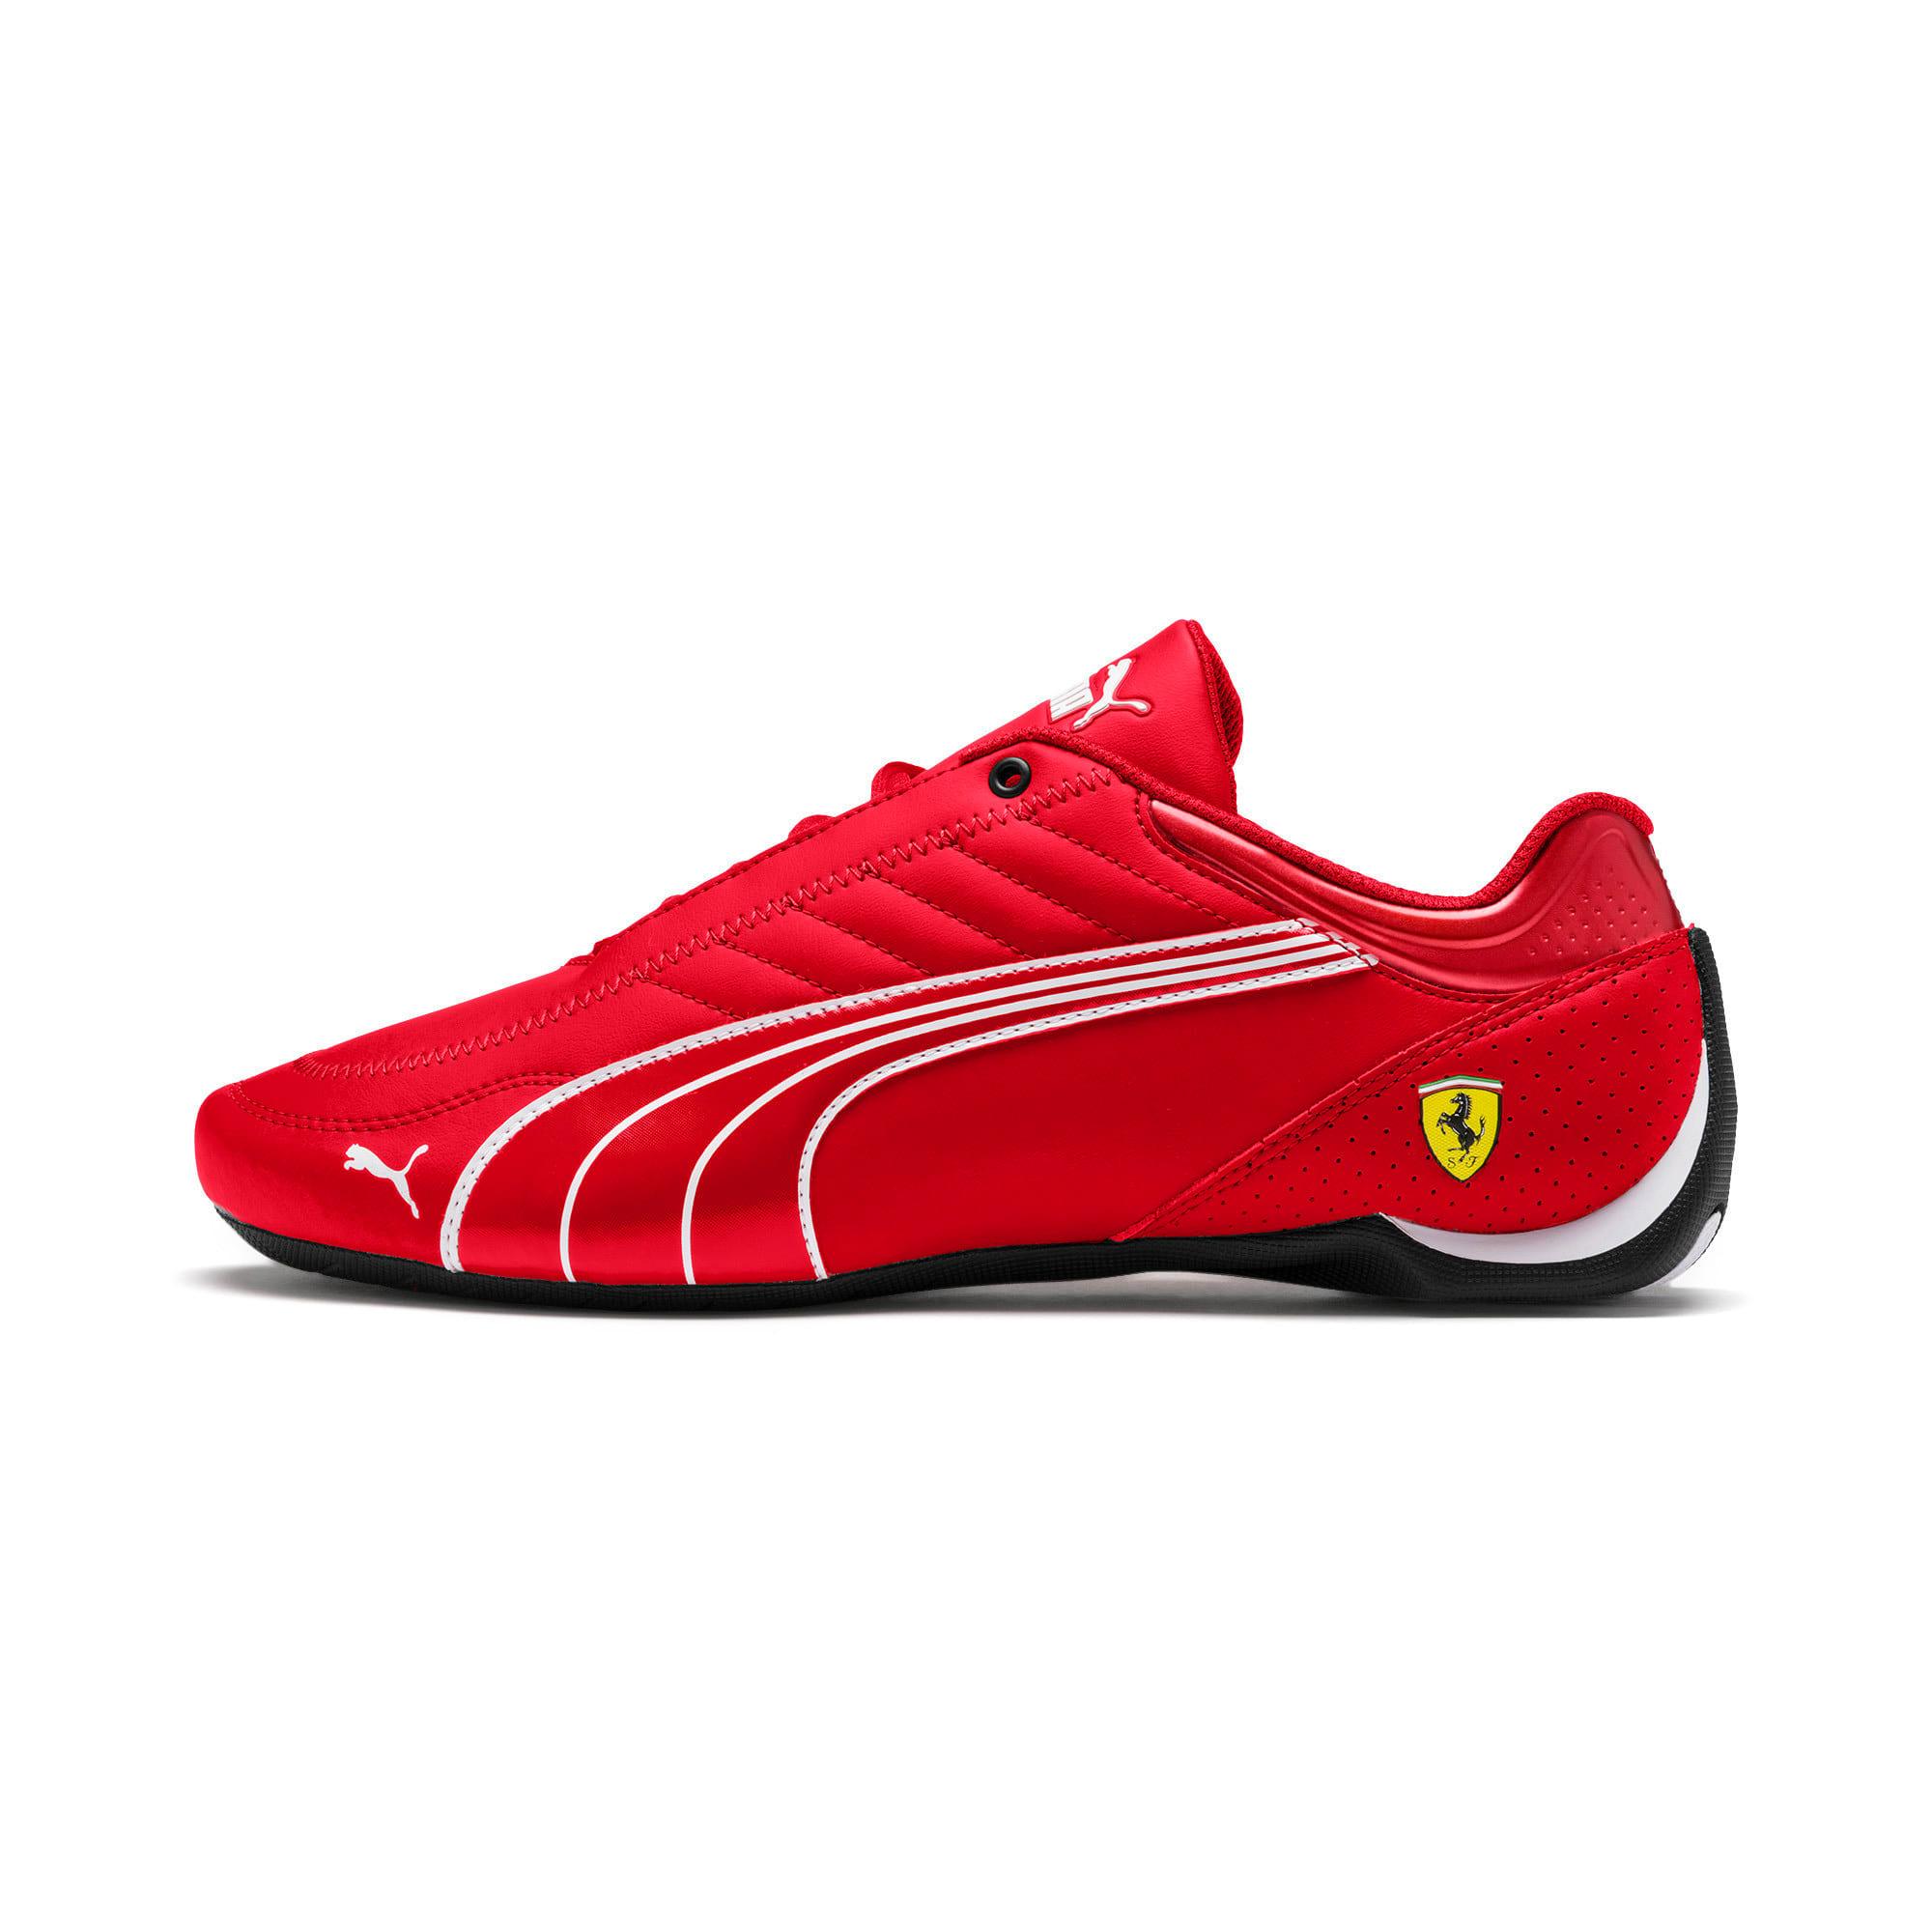 Miniatura 1 de ZapatosScuderiaFerrariFuture Kart Cat, Rosso Corsa-Puma Black, mediano